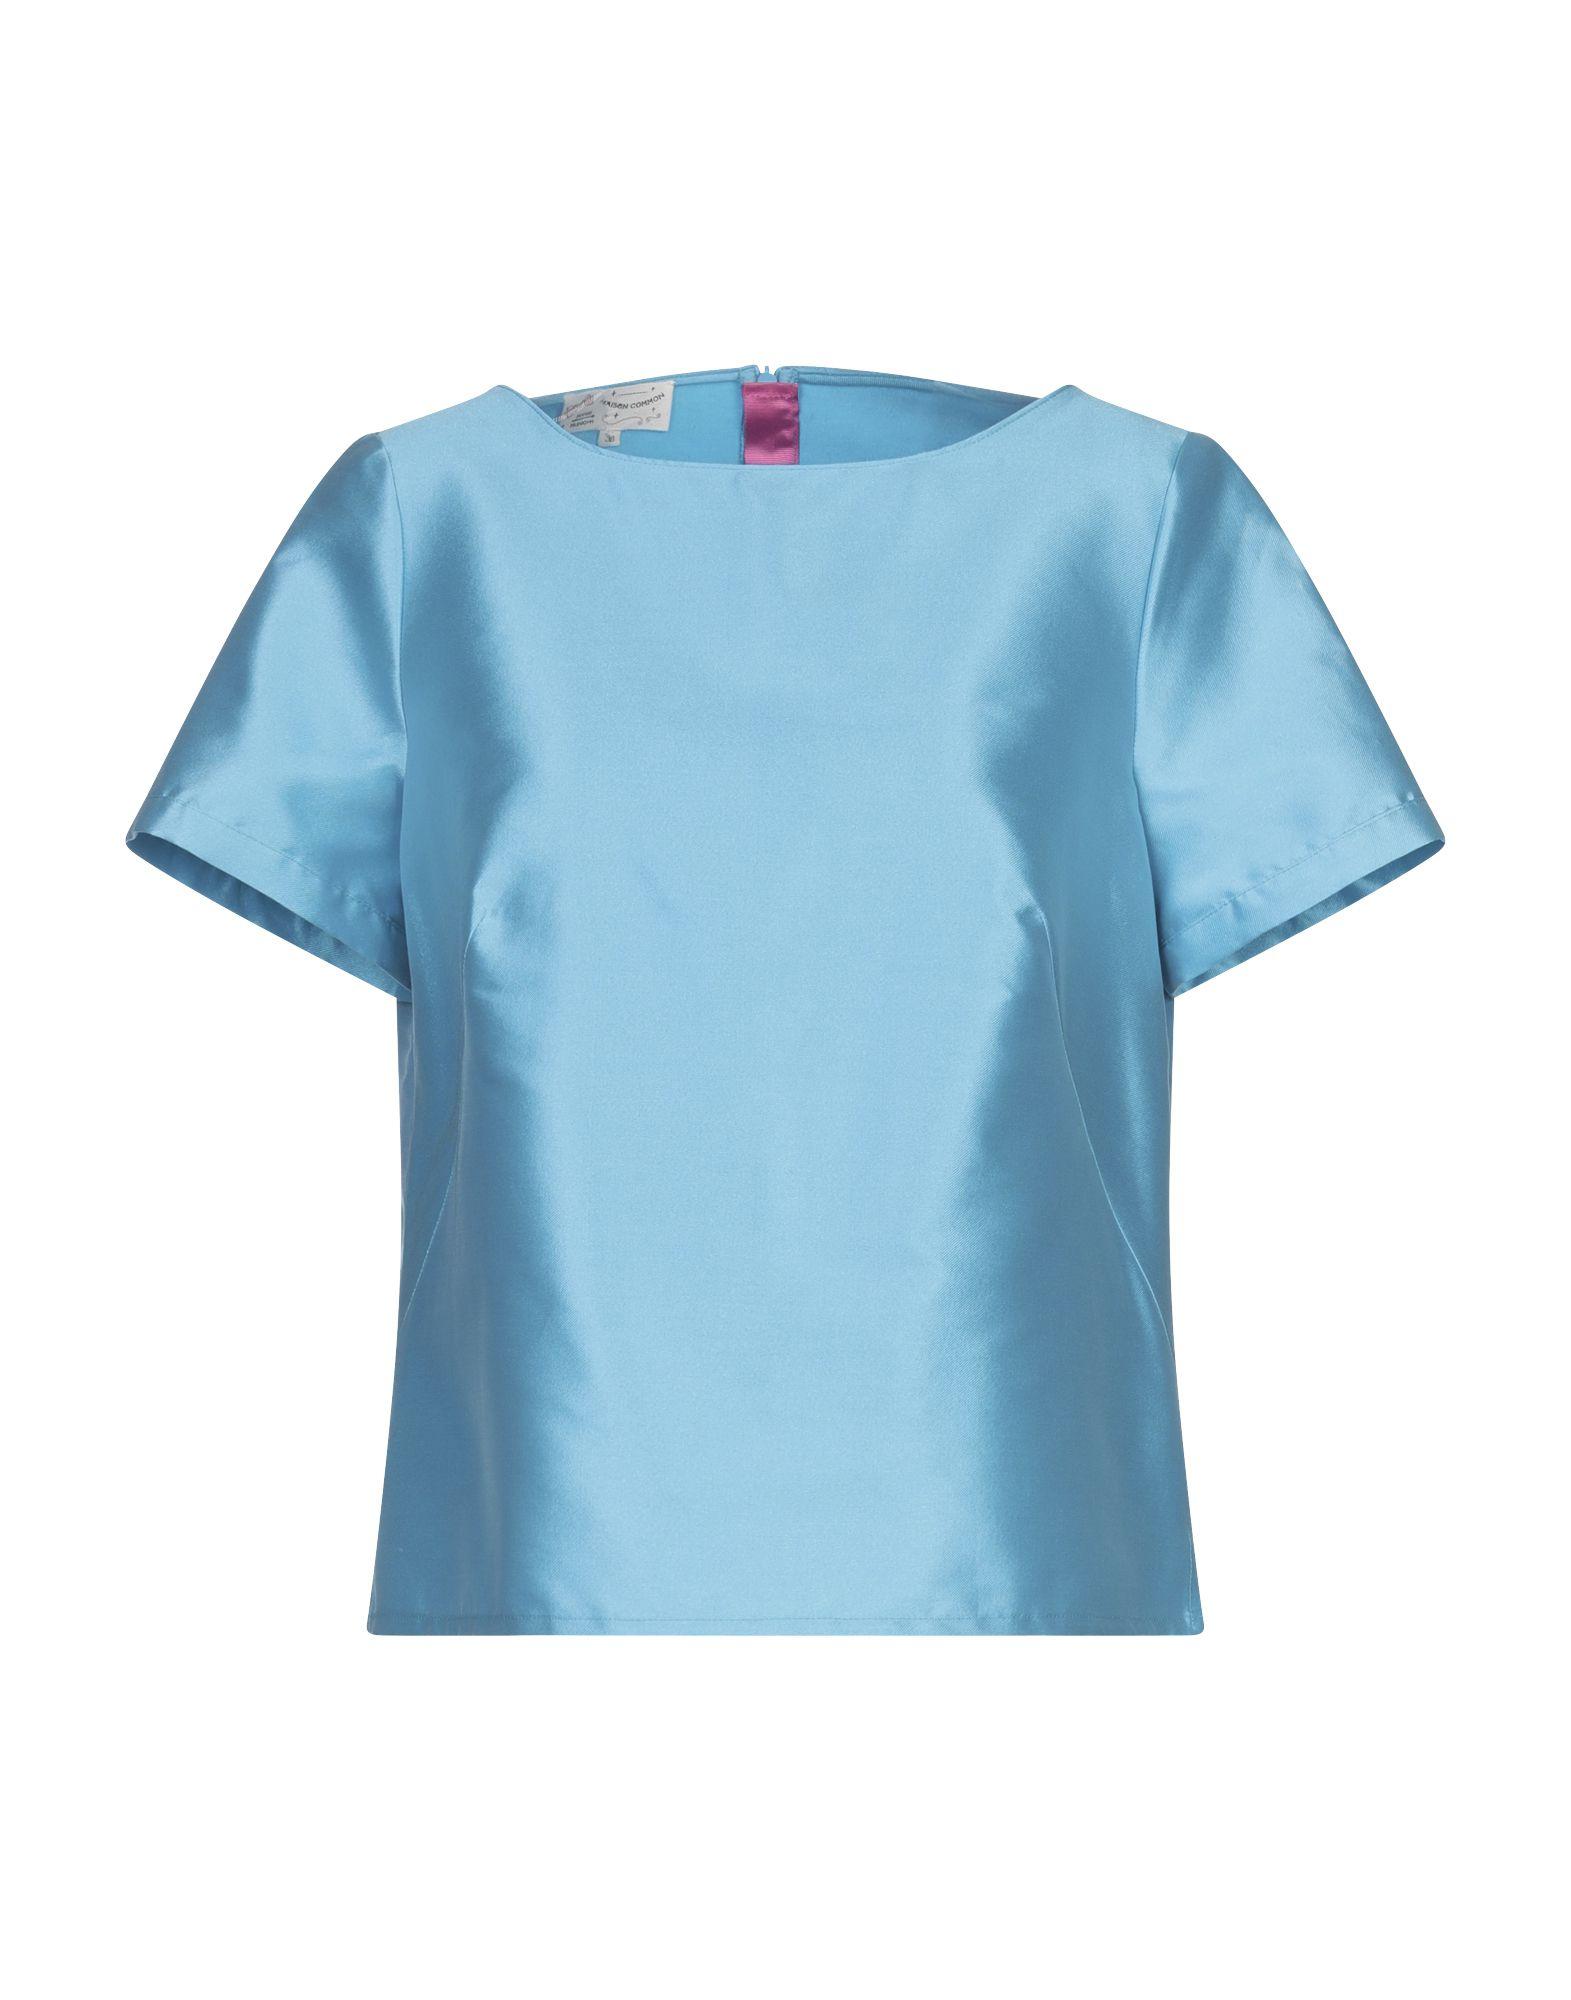 MAISON COMMON Блузка цены онлайн